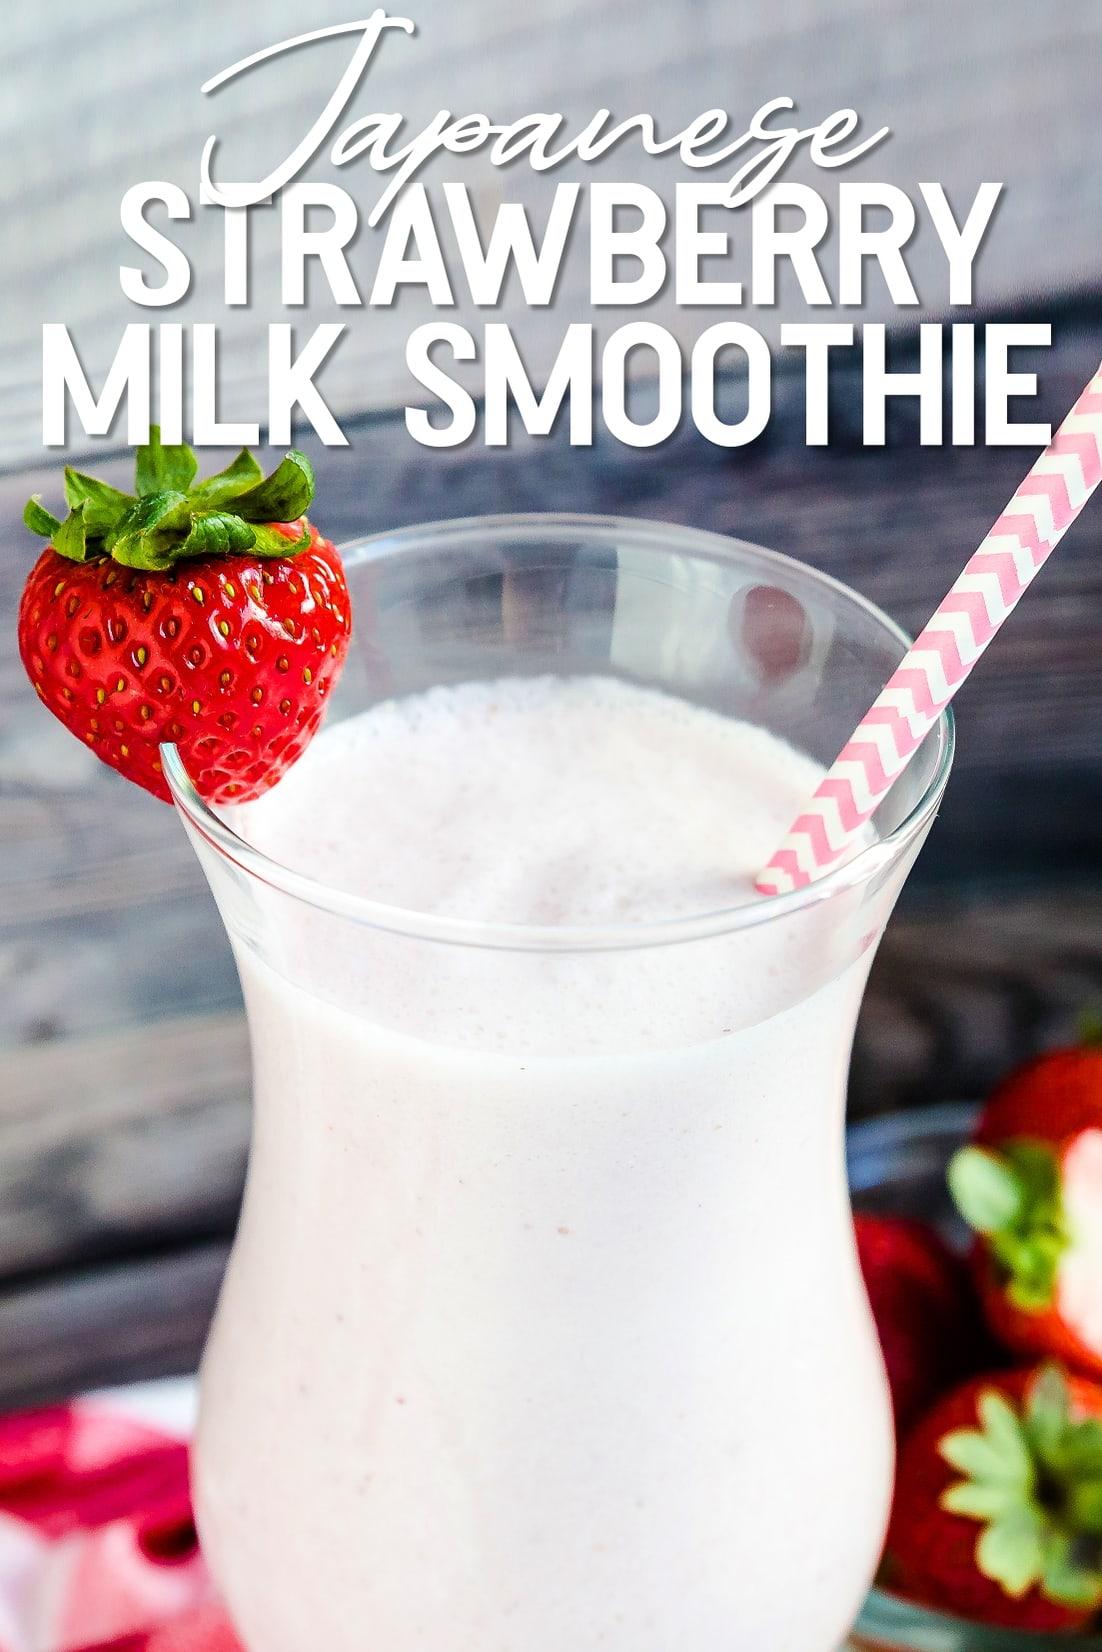 Japanese Style Strawberry Milk Smoothie close up